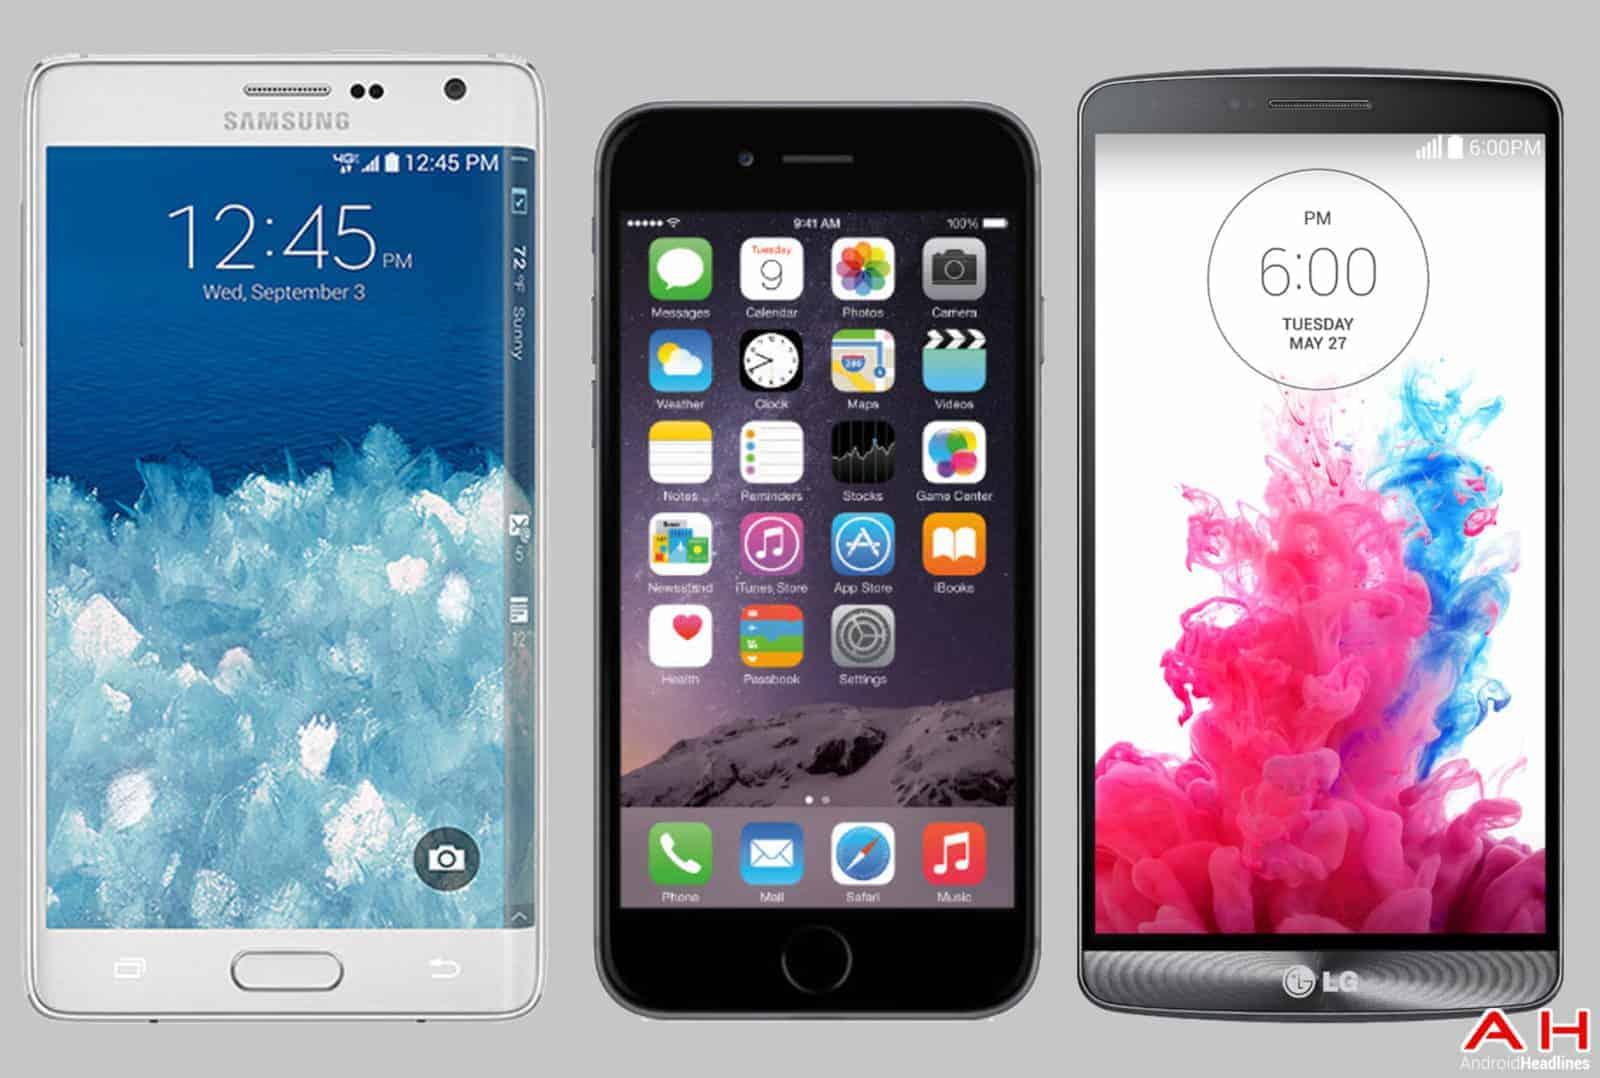 SamsungAppleLG Top Phones cam AH